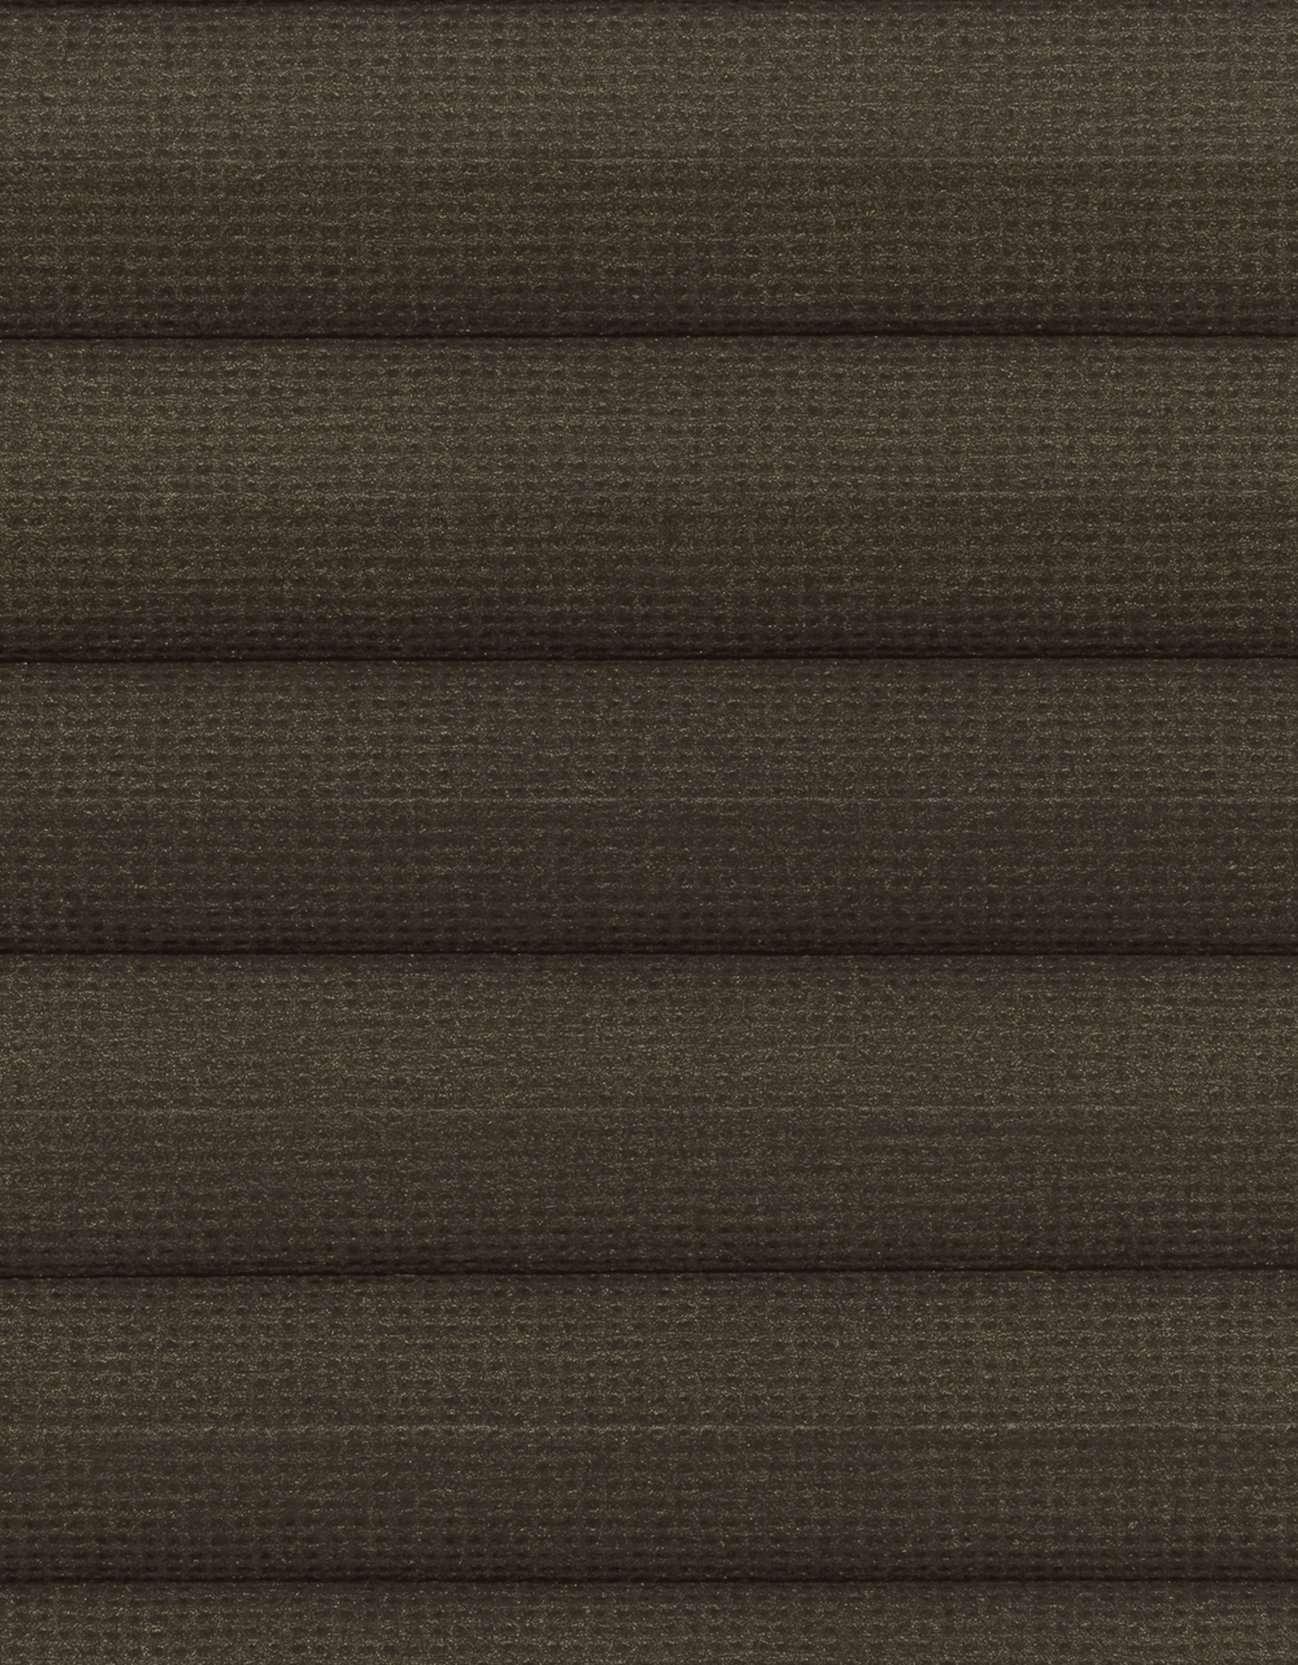 Semi-transparant Dupligordijnen 25 mm Kleurstaal Klei